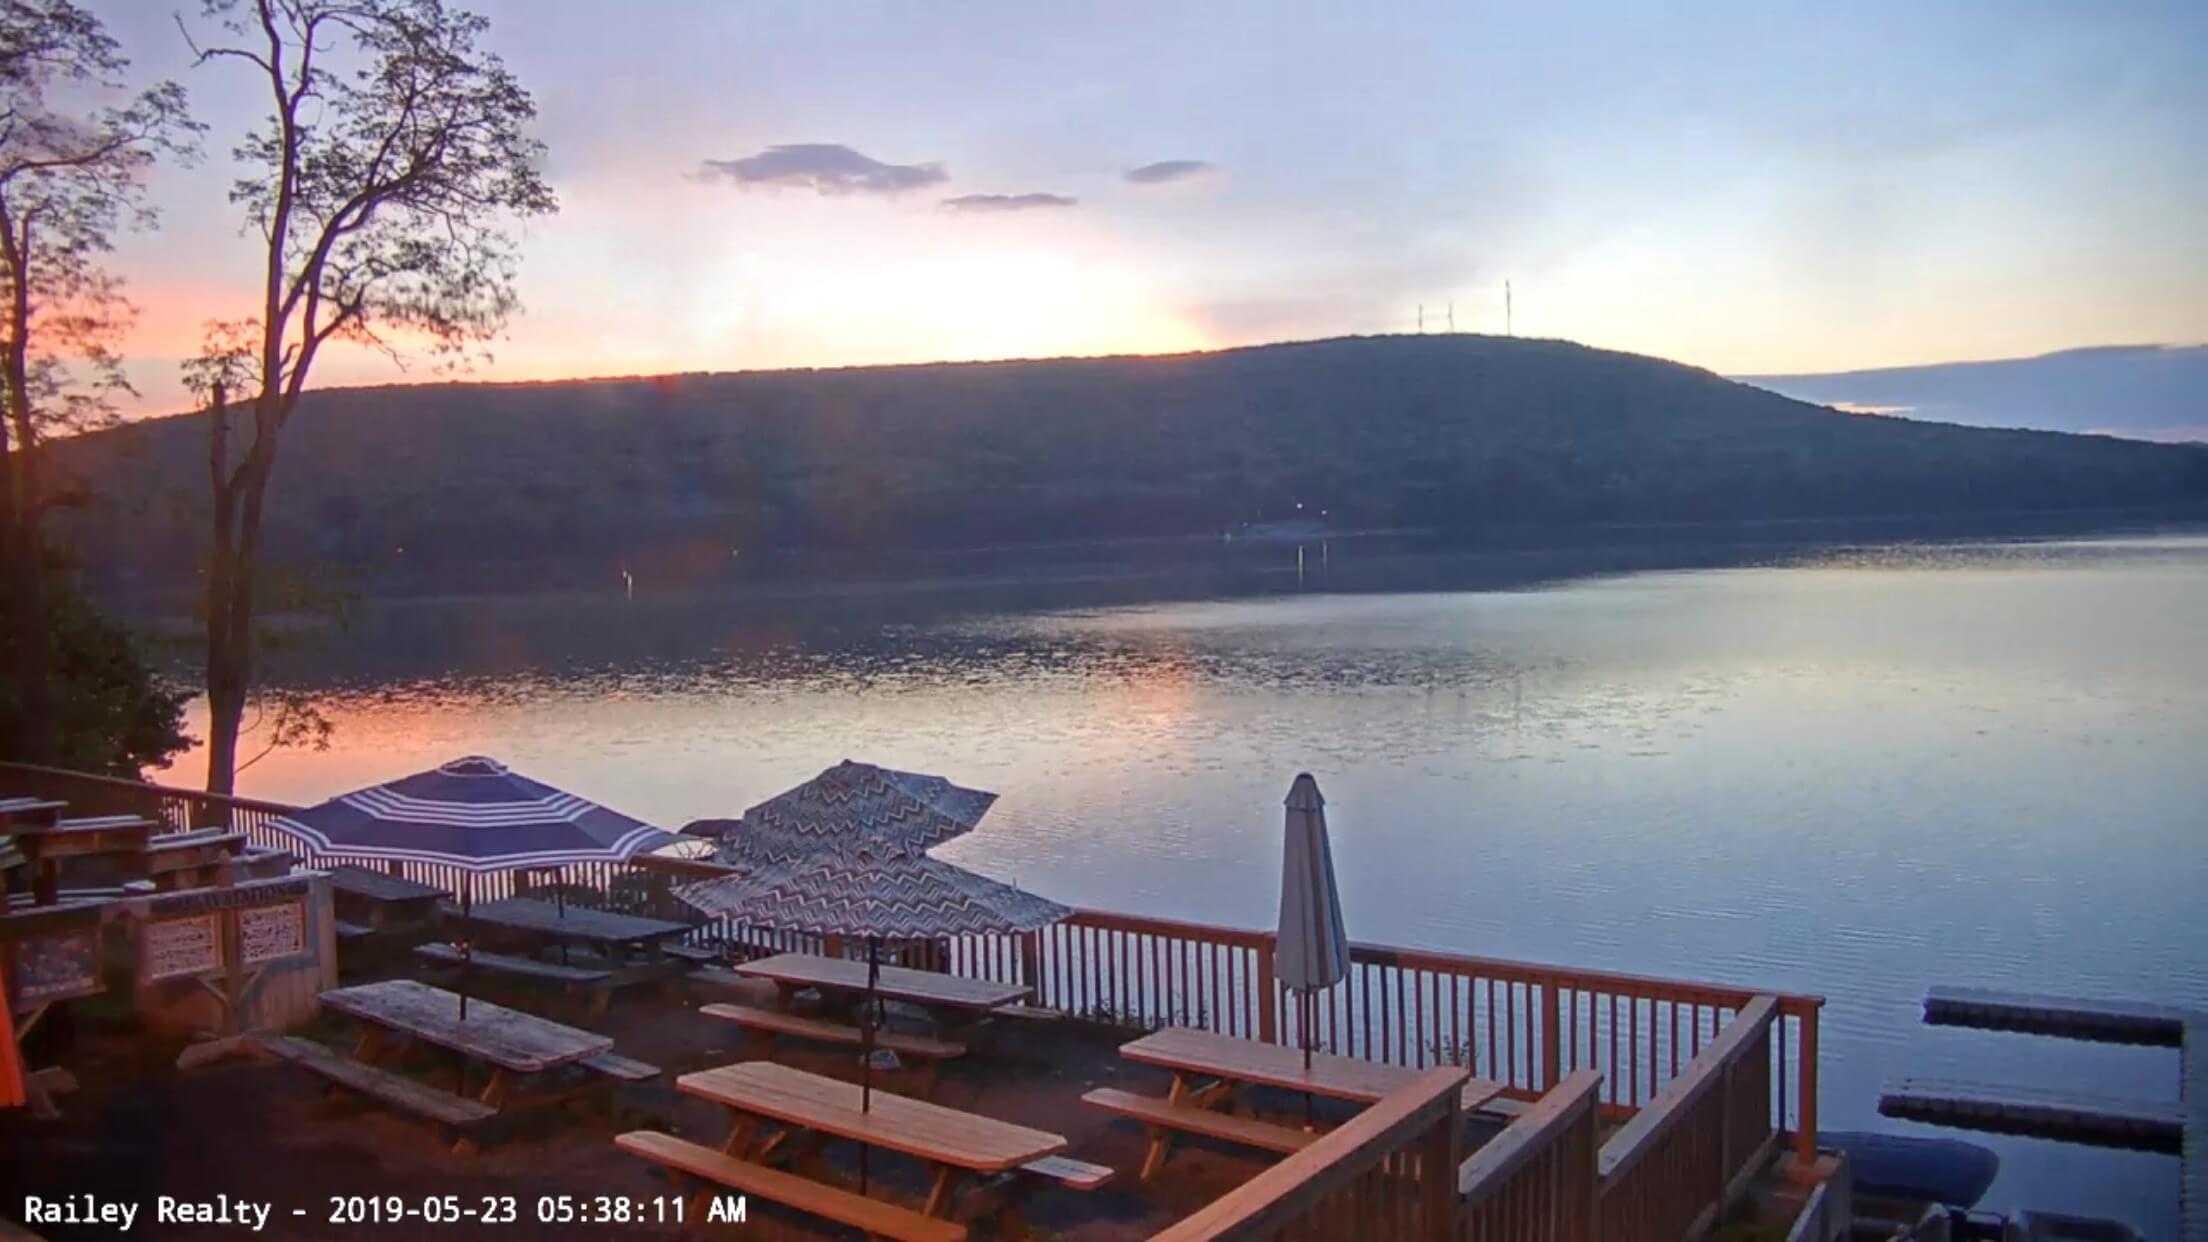 Railey Realty Webcam at Lakeside Creamery at Deep Creek Lake, MD